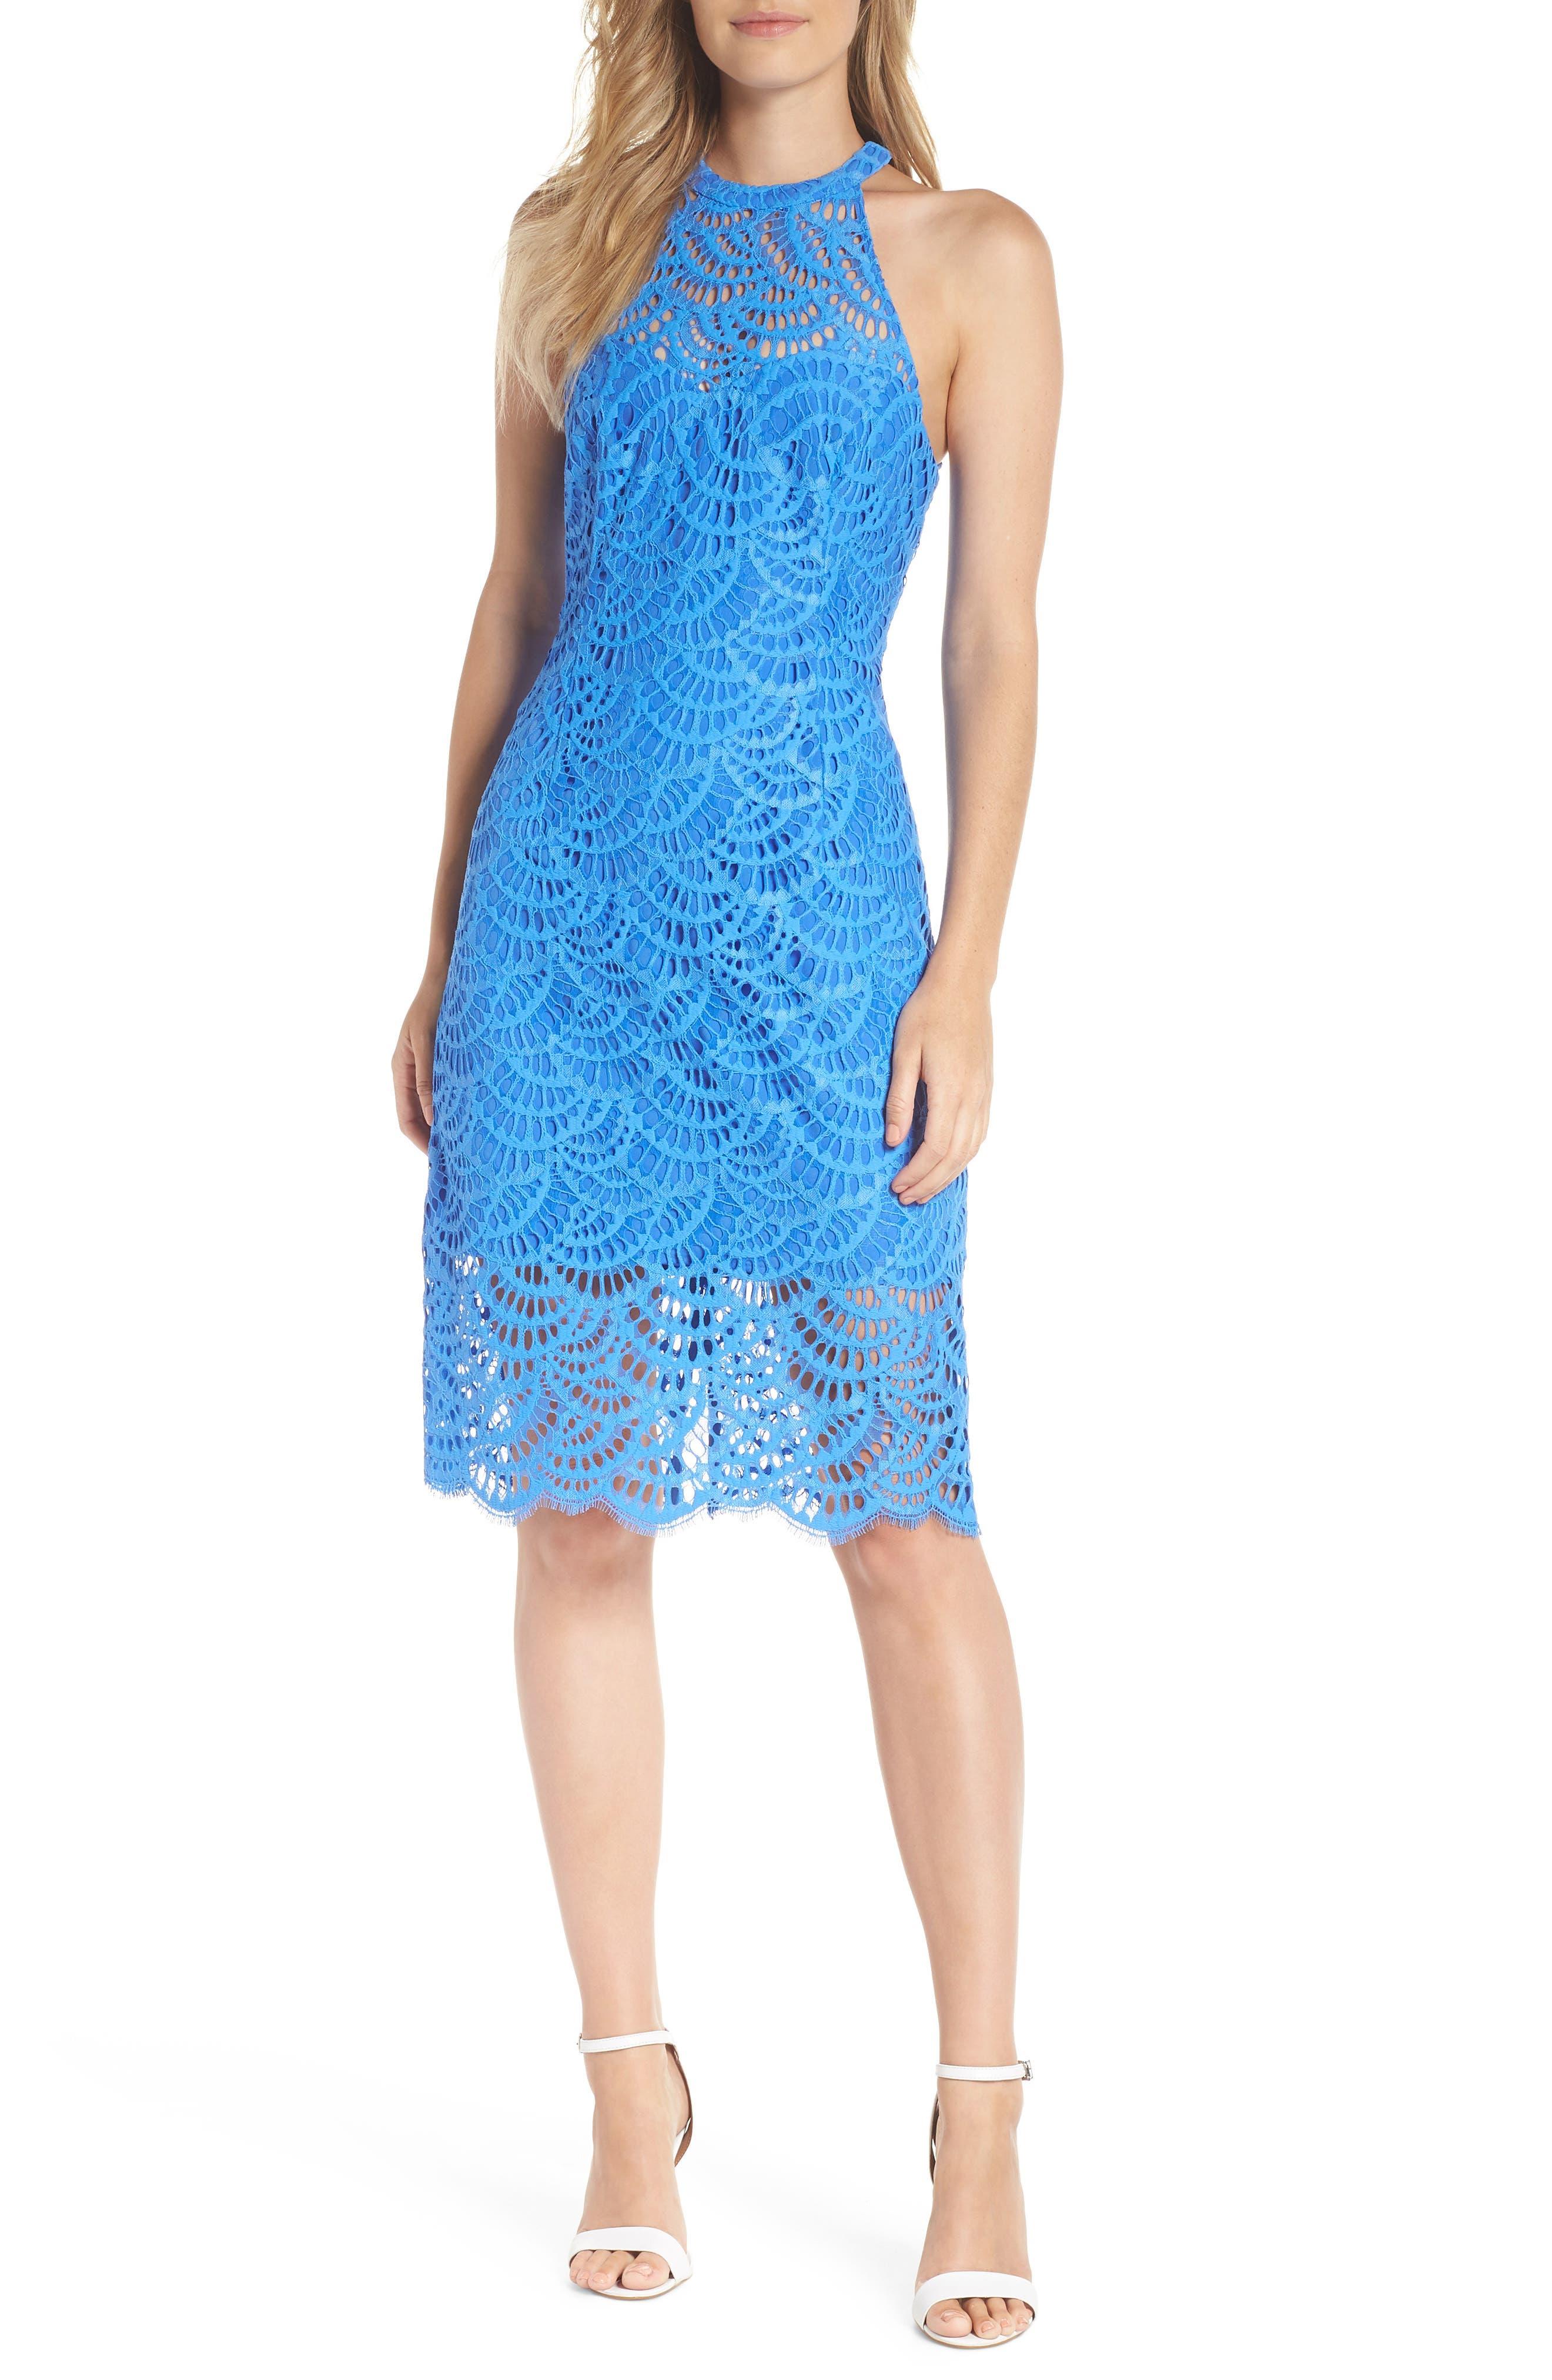 Lilly Pulitzer Kenna Lace Sheath Dress, Blue